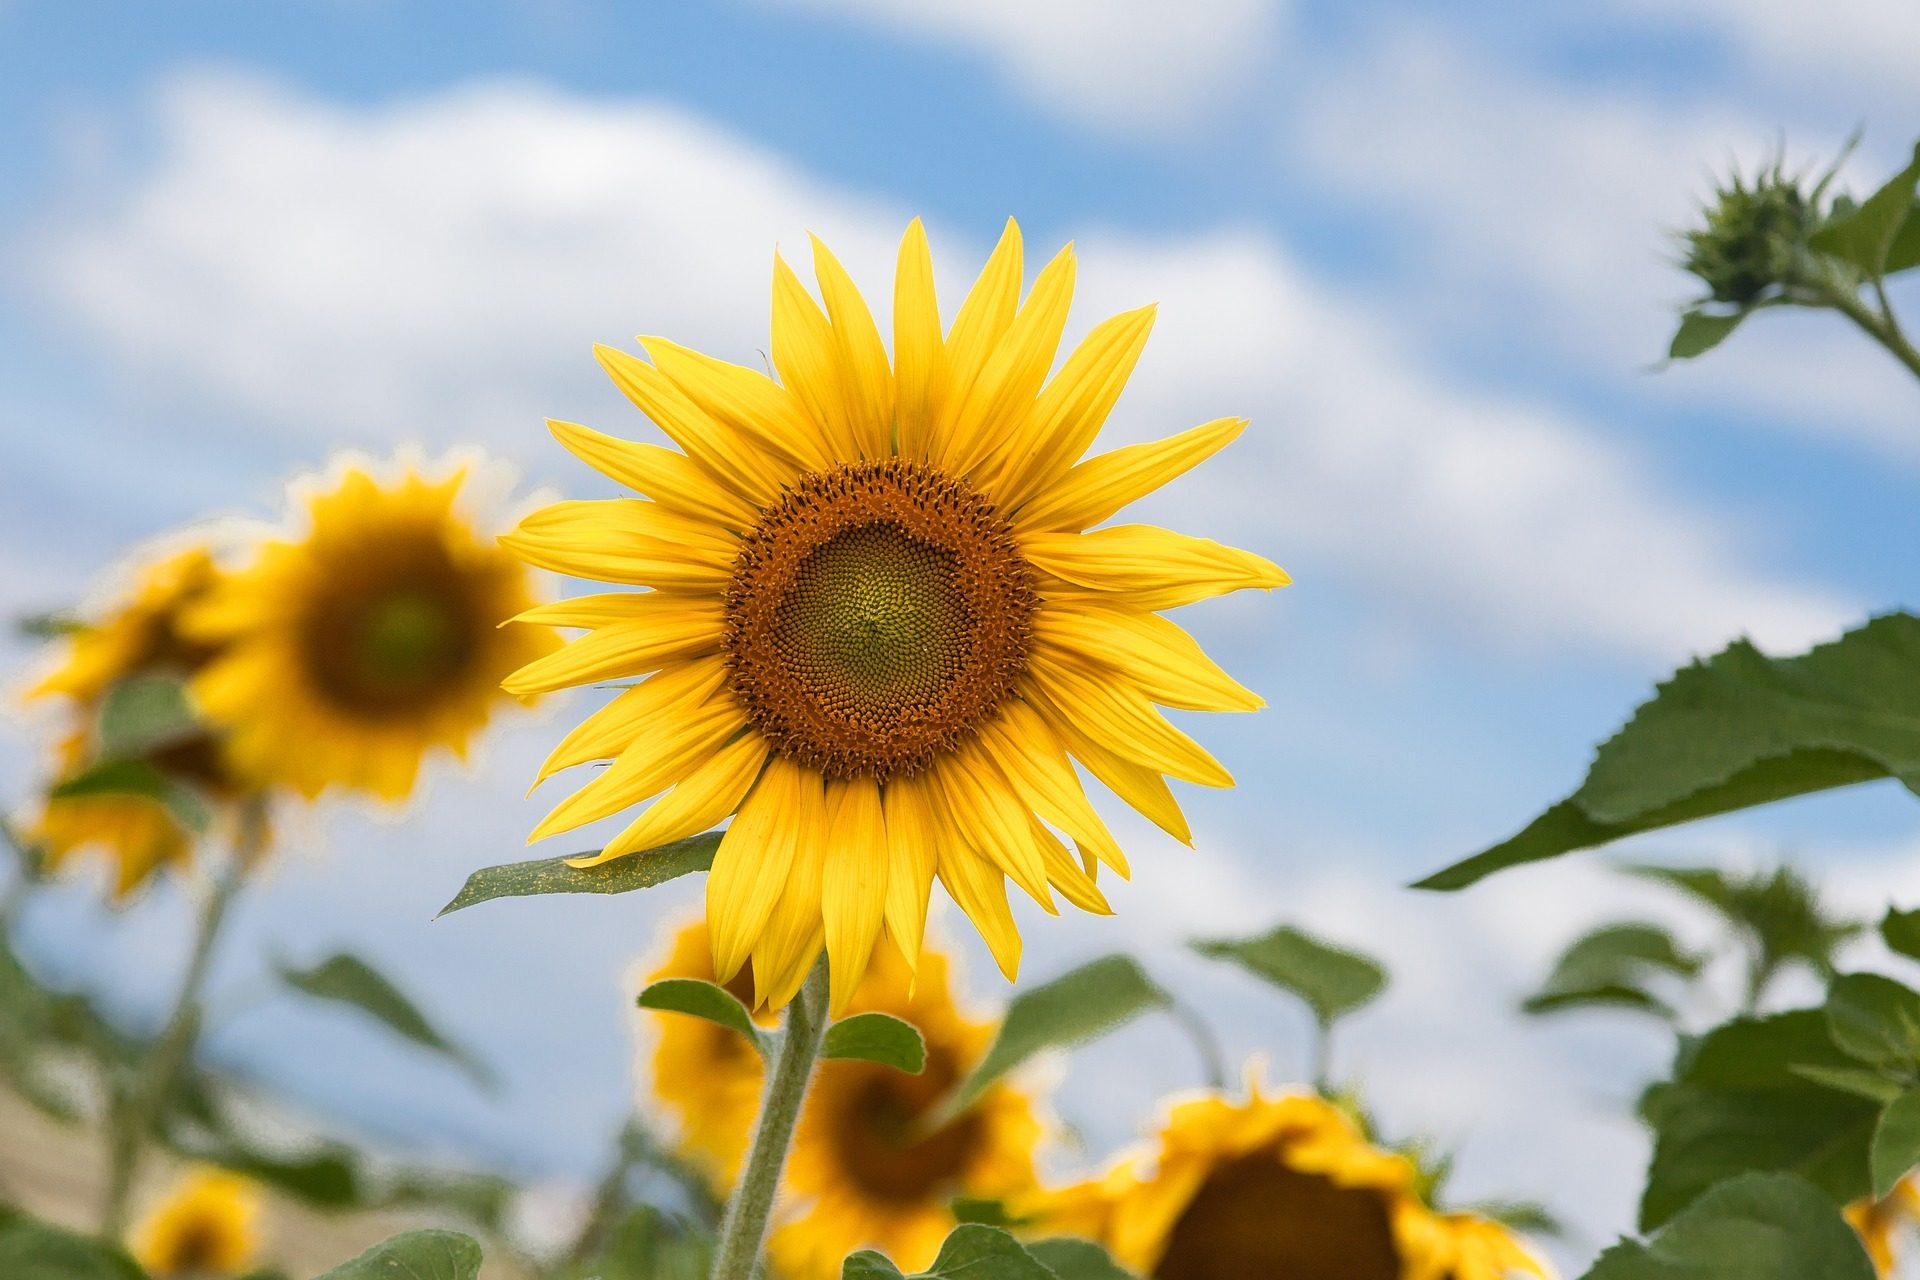 Sonnenblume, Blume, Anbau, Plantage, Blütenblätter - Wallpaper HD - Prof.-falken.com